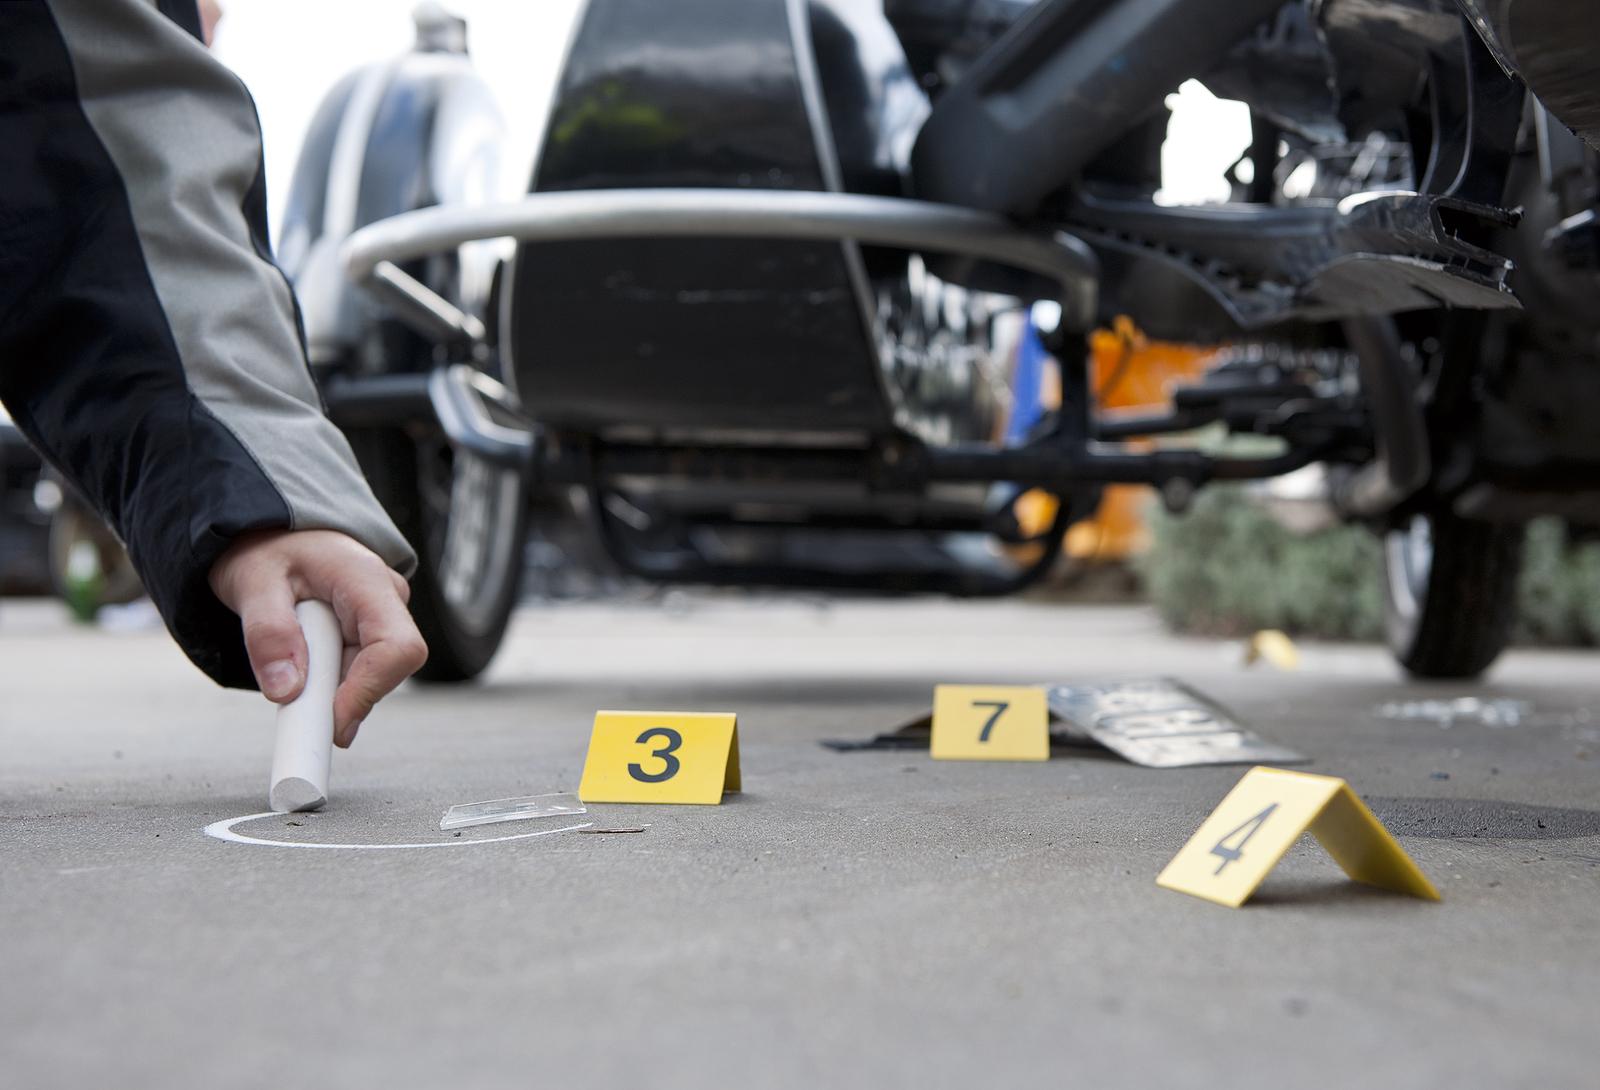 Криминалистическая характеристика ДТП